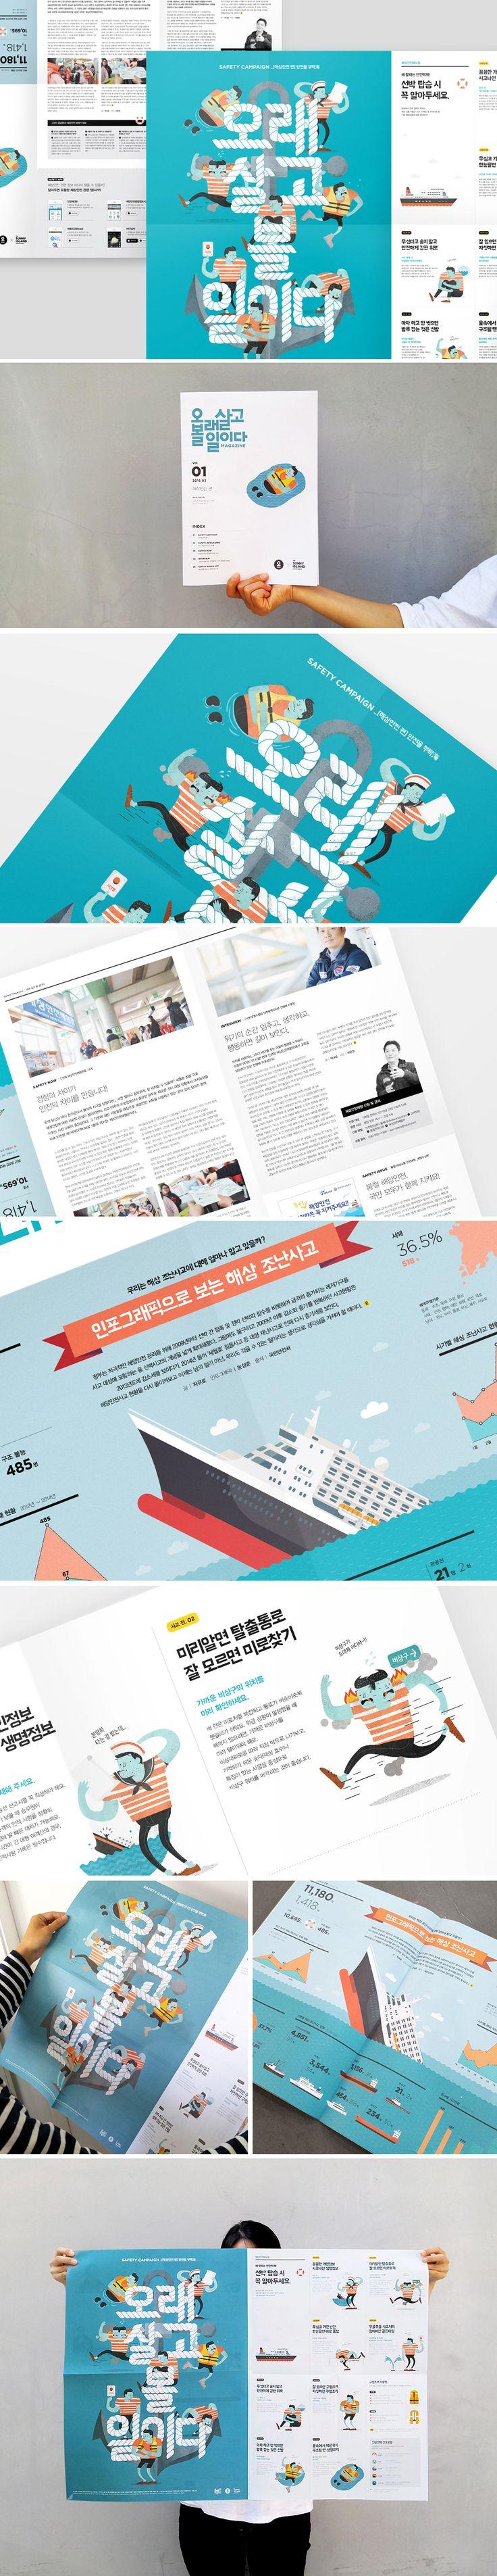 OSAFE 오래살고볼일이다 (안전매거진1호) 해상안전편,SUNNYISLAND, SafetyDesign, Magazine, Design